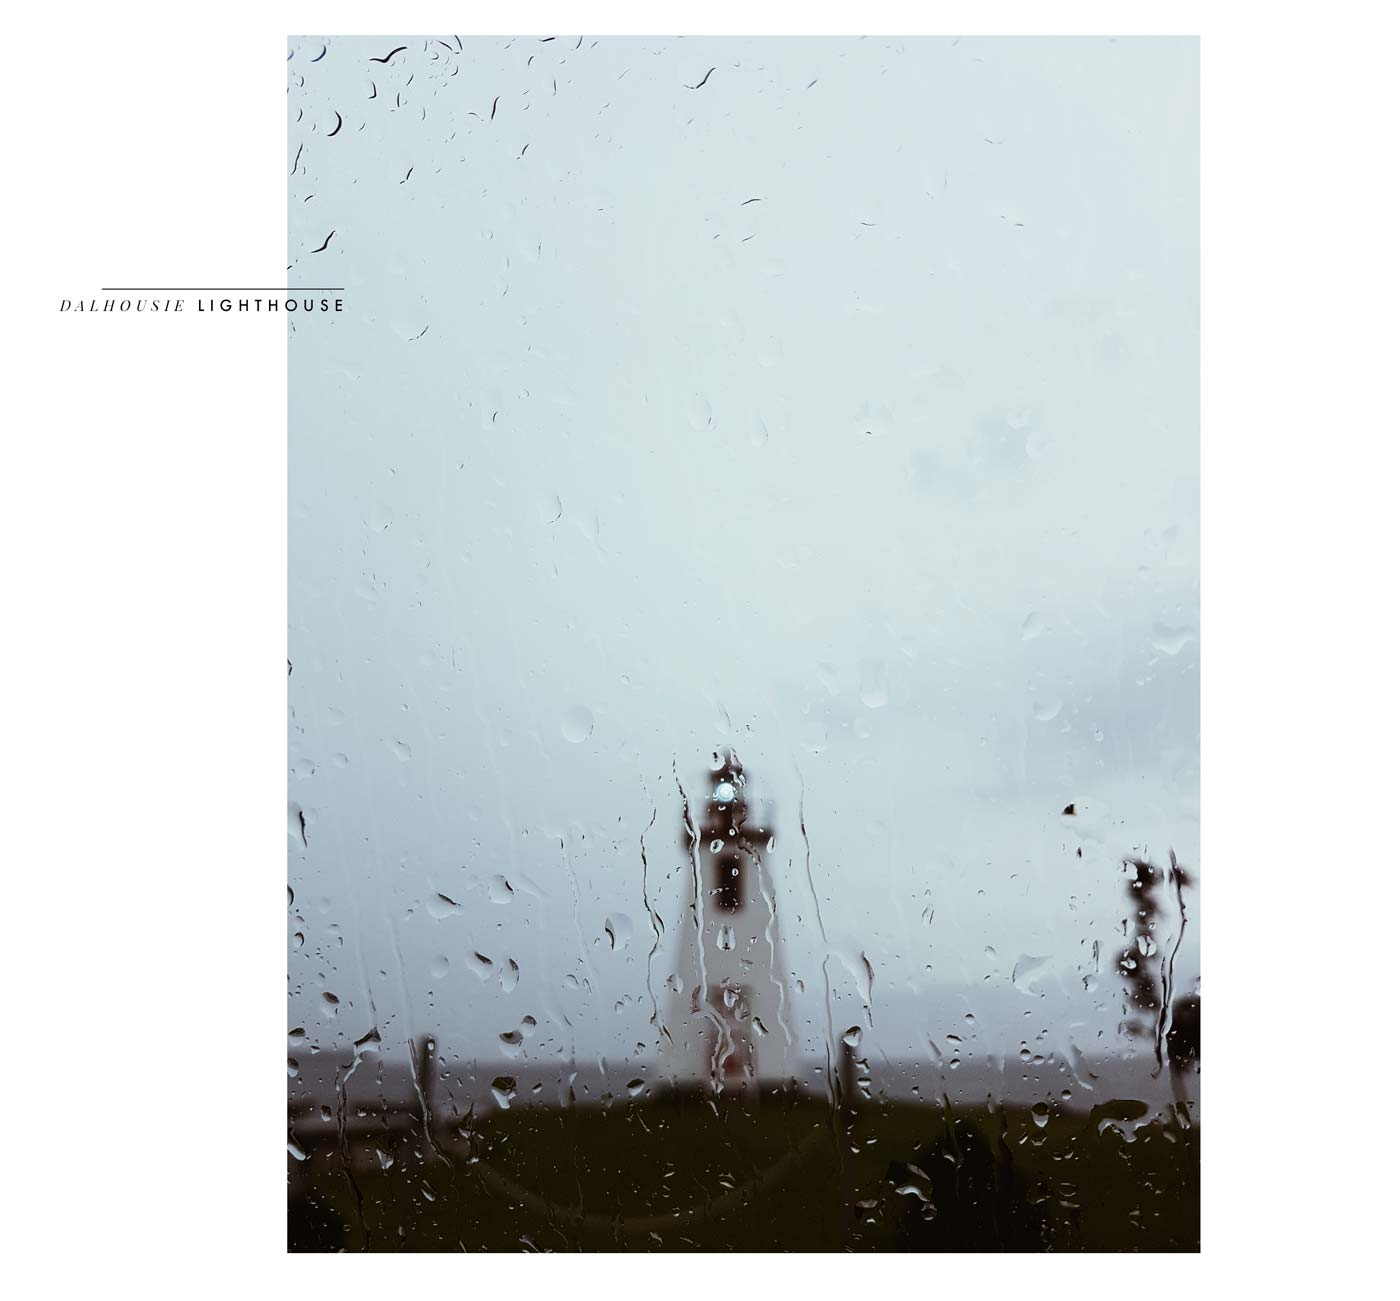 new brunswick lighthouse